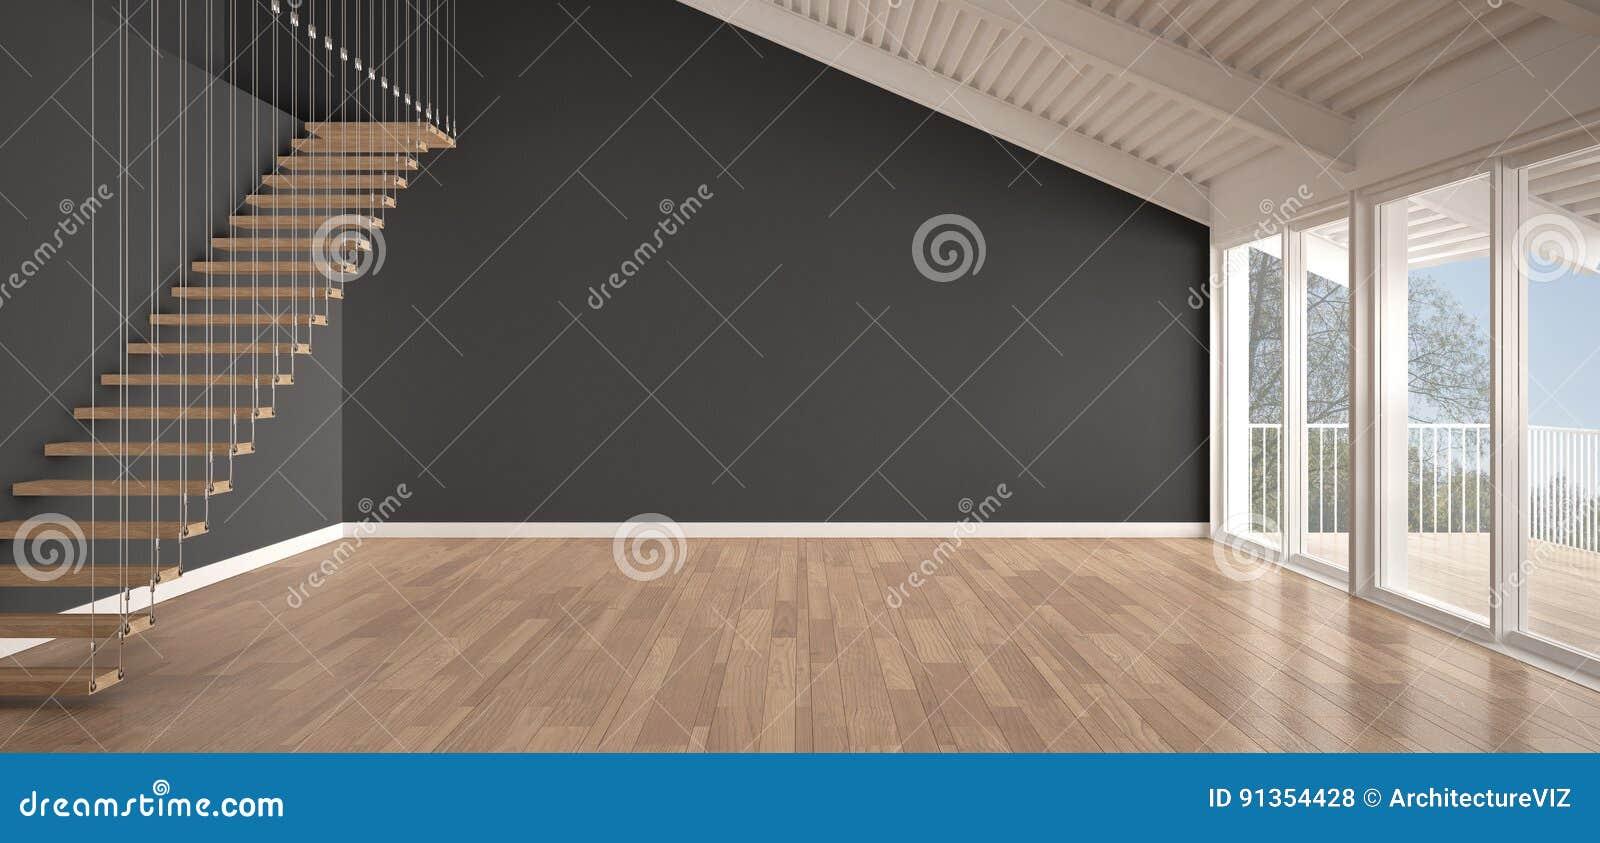 Minimalist Mezzanine Loft Empty Industrial Space Metal Roofing Stock Illustration Illustration Of Design Architecture 91354428